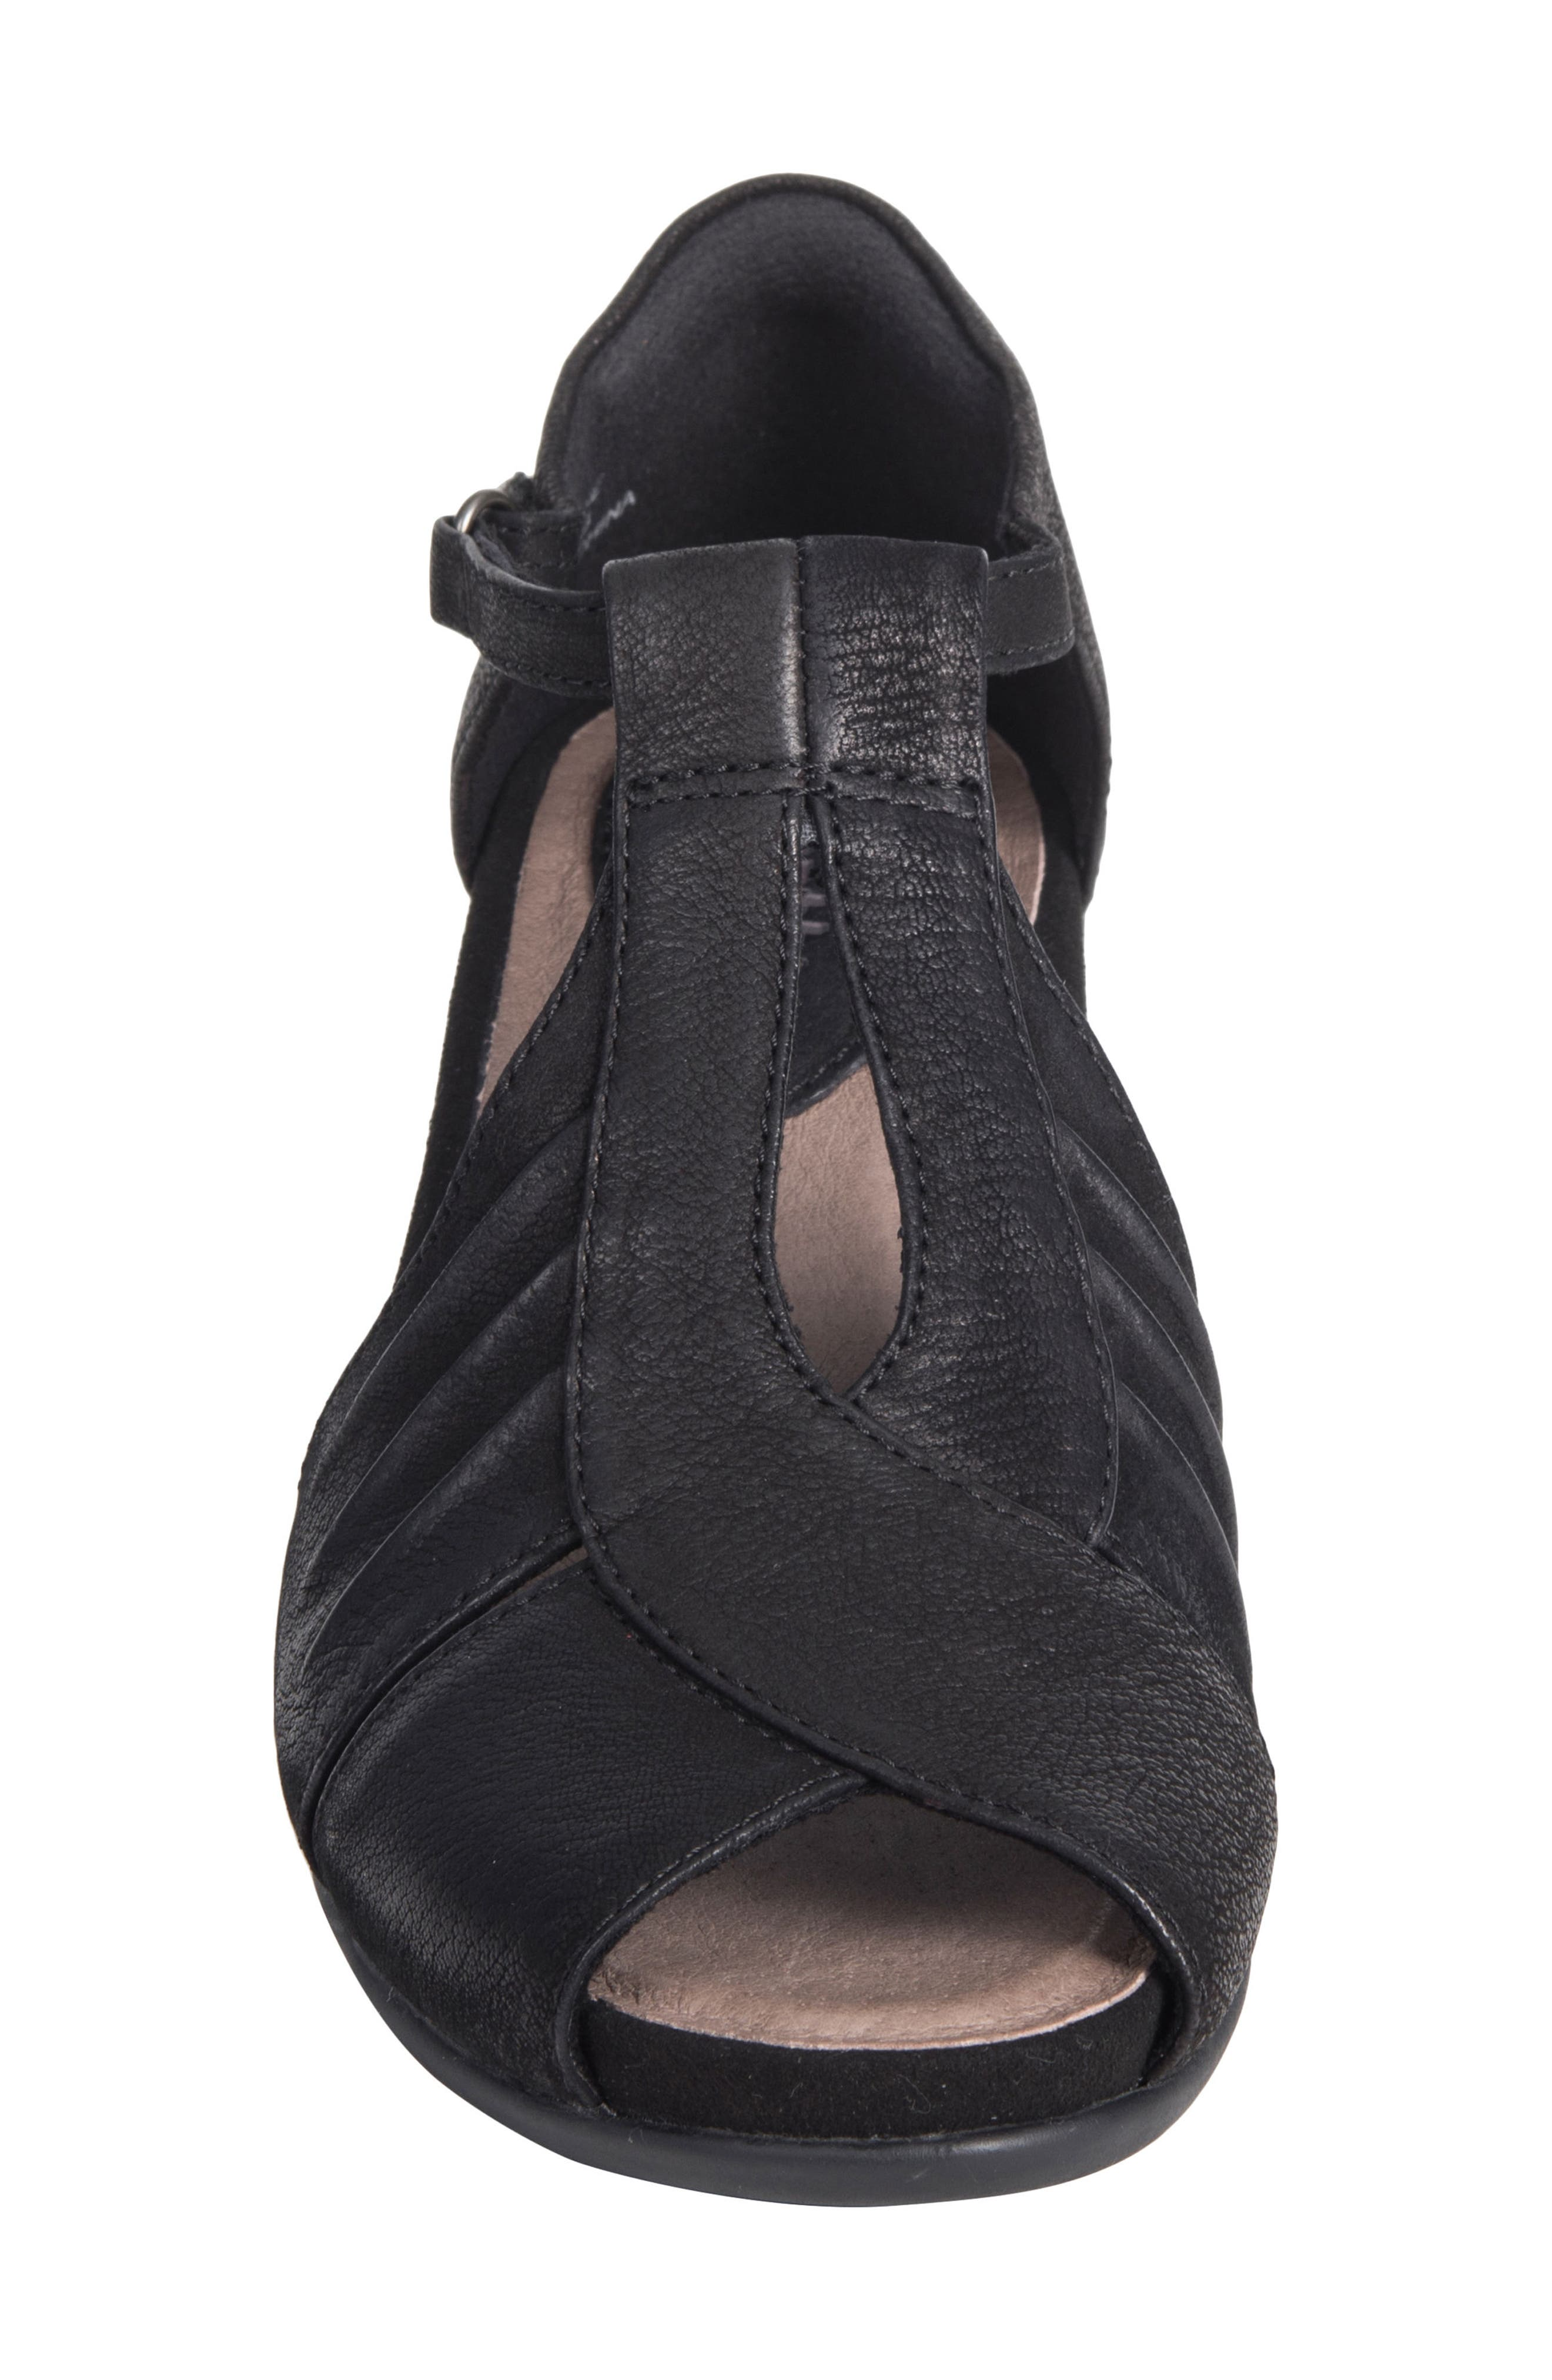 Primrose Wedge Sandal,                             Alternate thumbnail 4, color,                             001